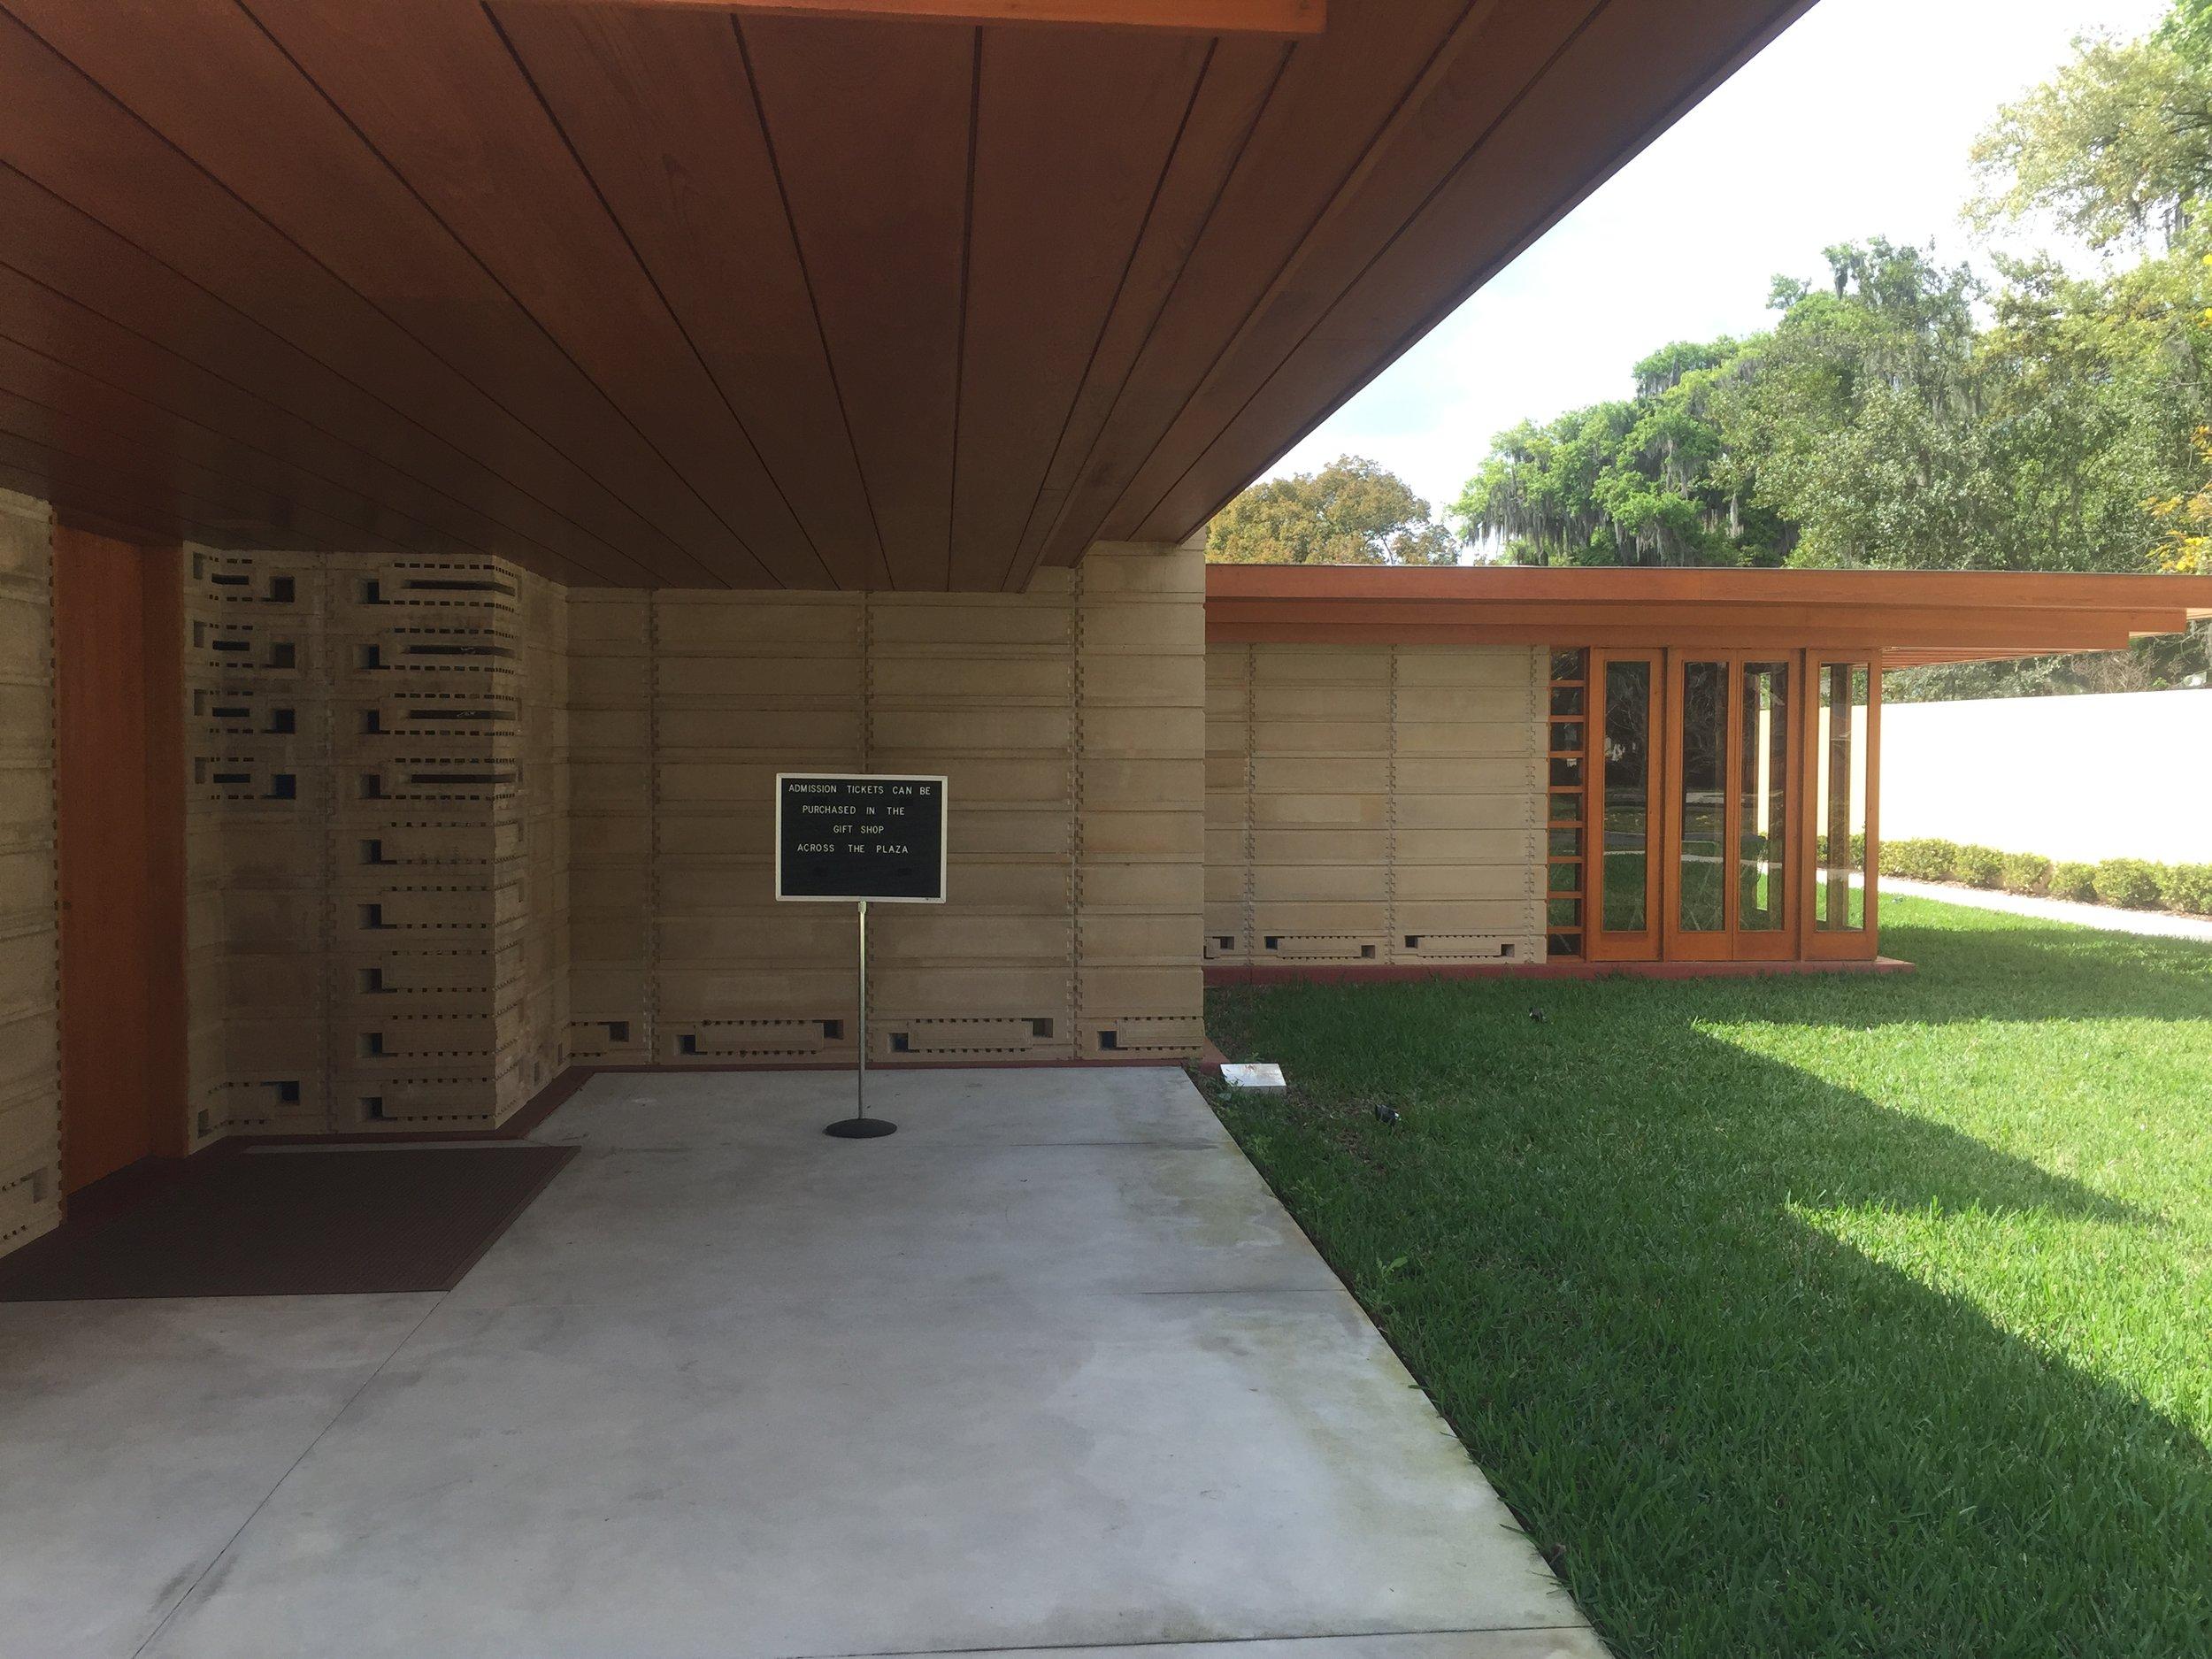 Florida Southern College, Frank Lloyd Wright, Lakeland Florida Florida Polytechnic Building, Santiago Calatrava© 2016 David Harrop